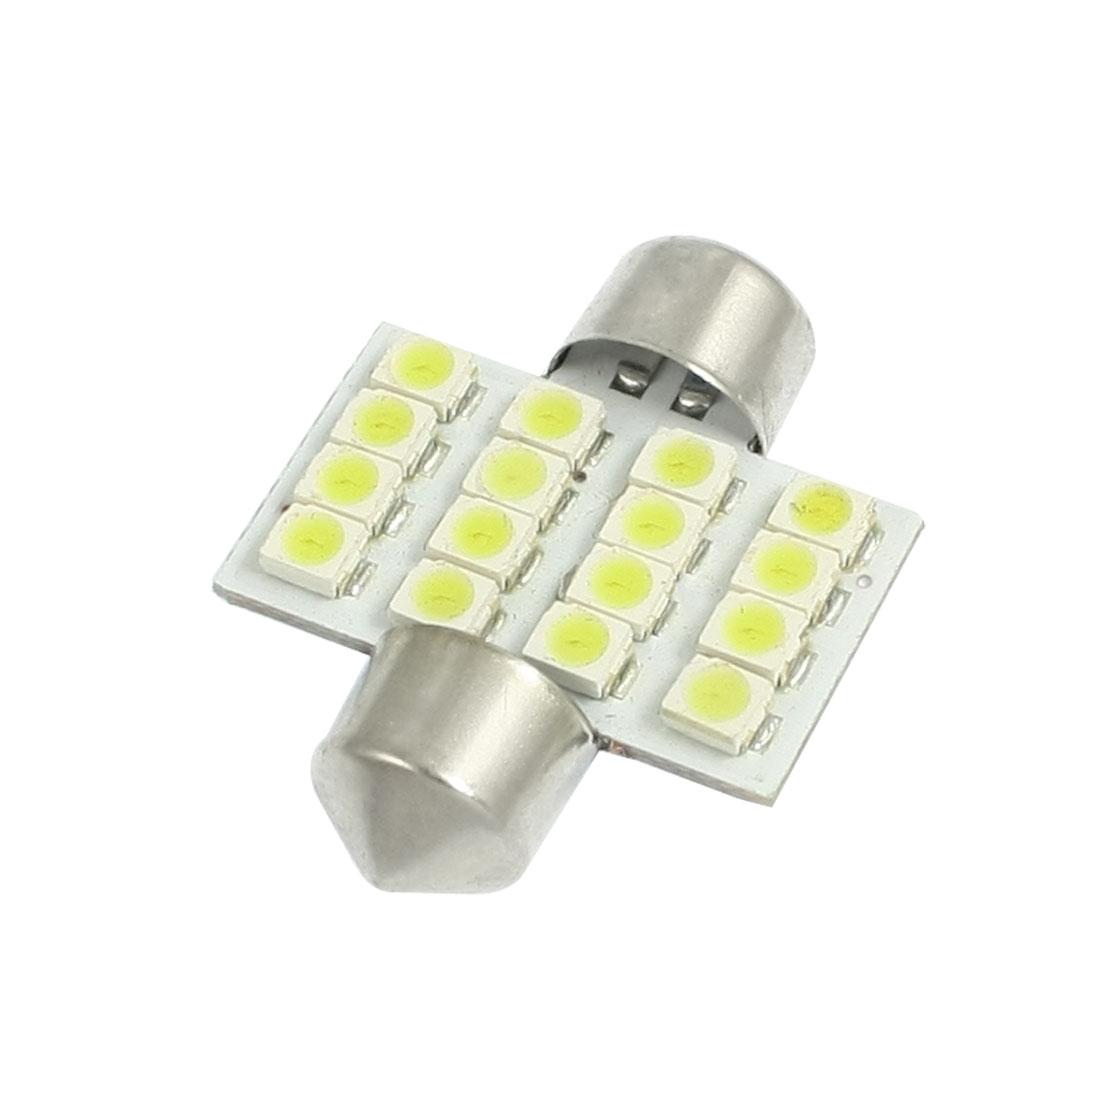 Car Auto 31mm White 16 1210 SMD Festoon LED Light Signal Bulb internal